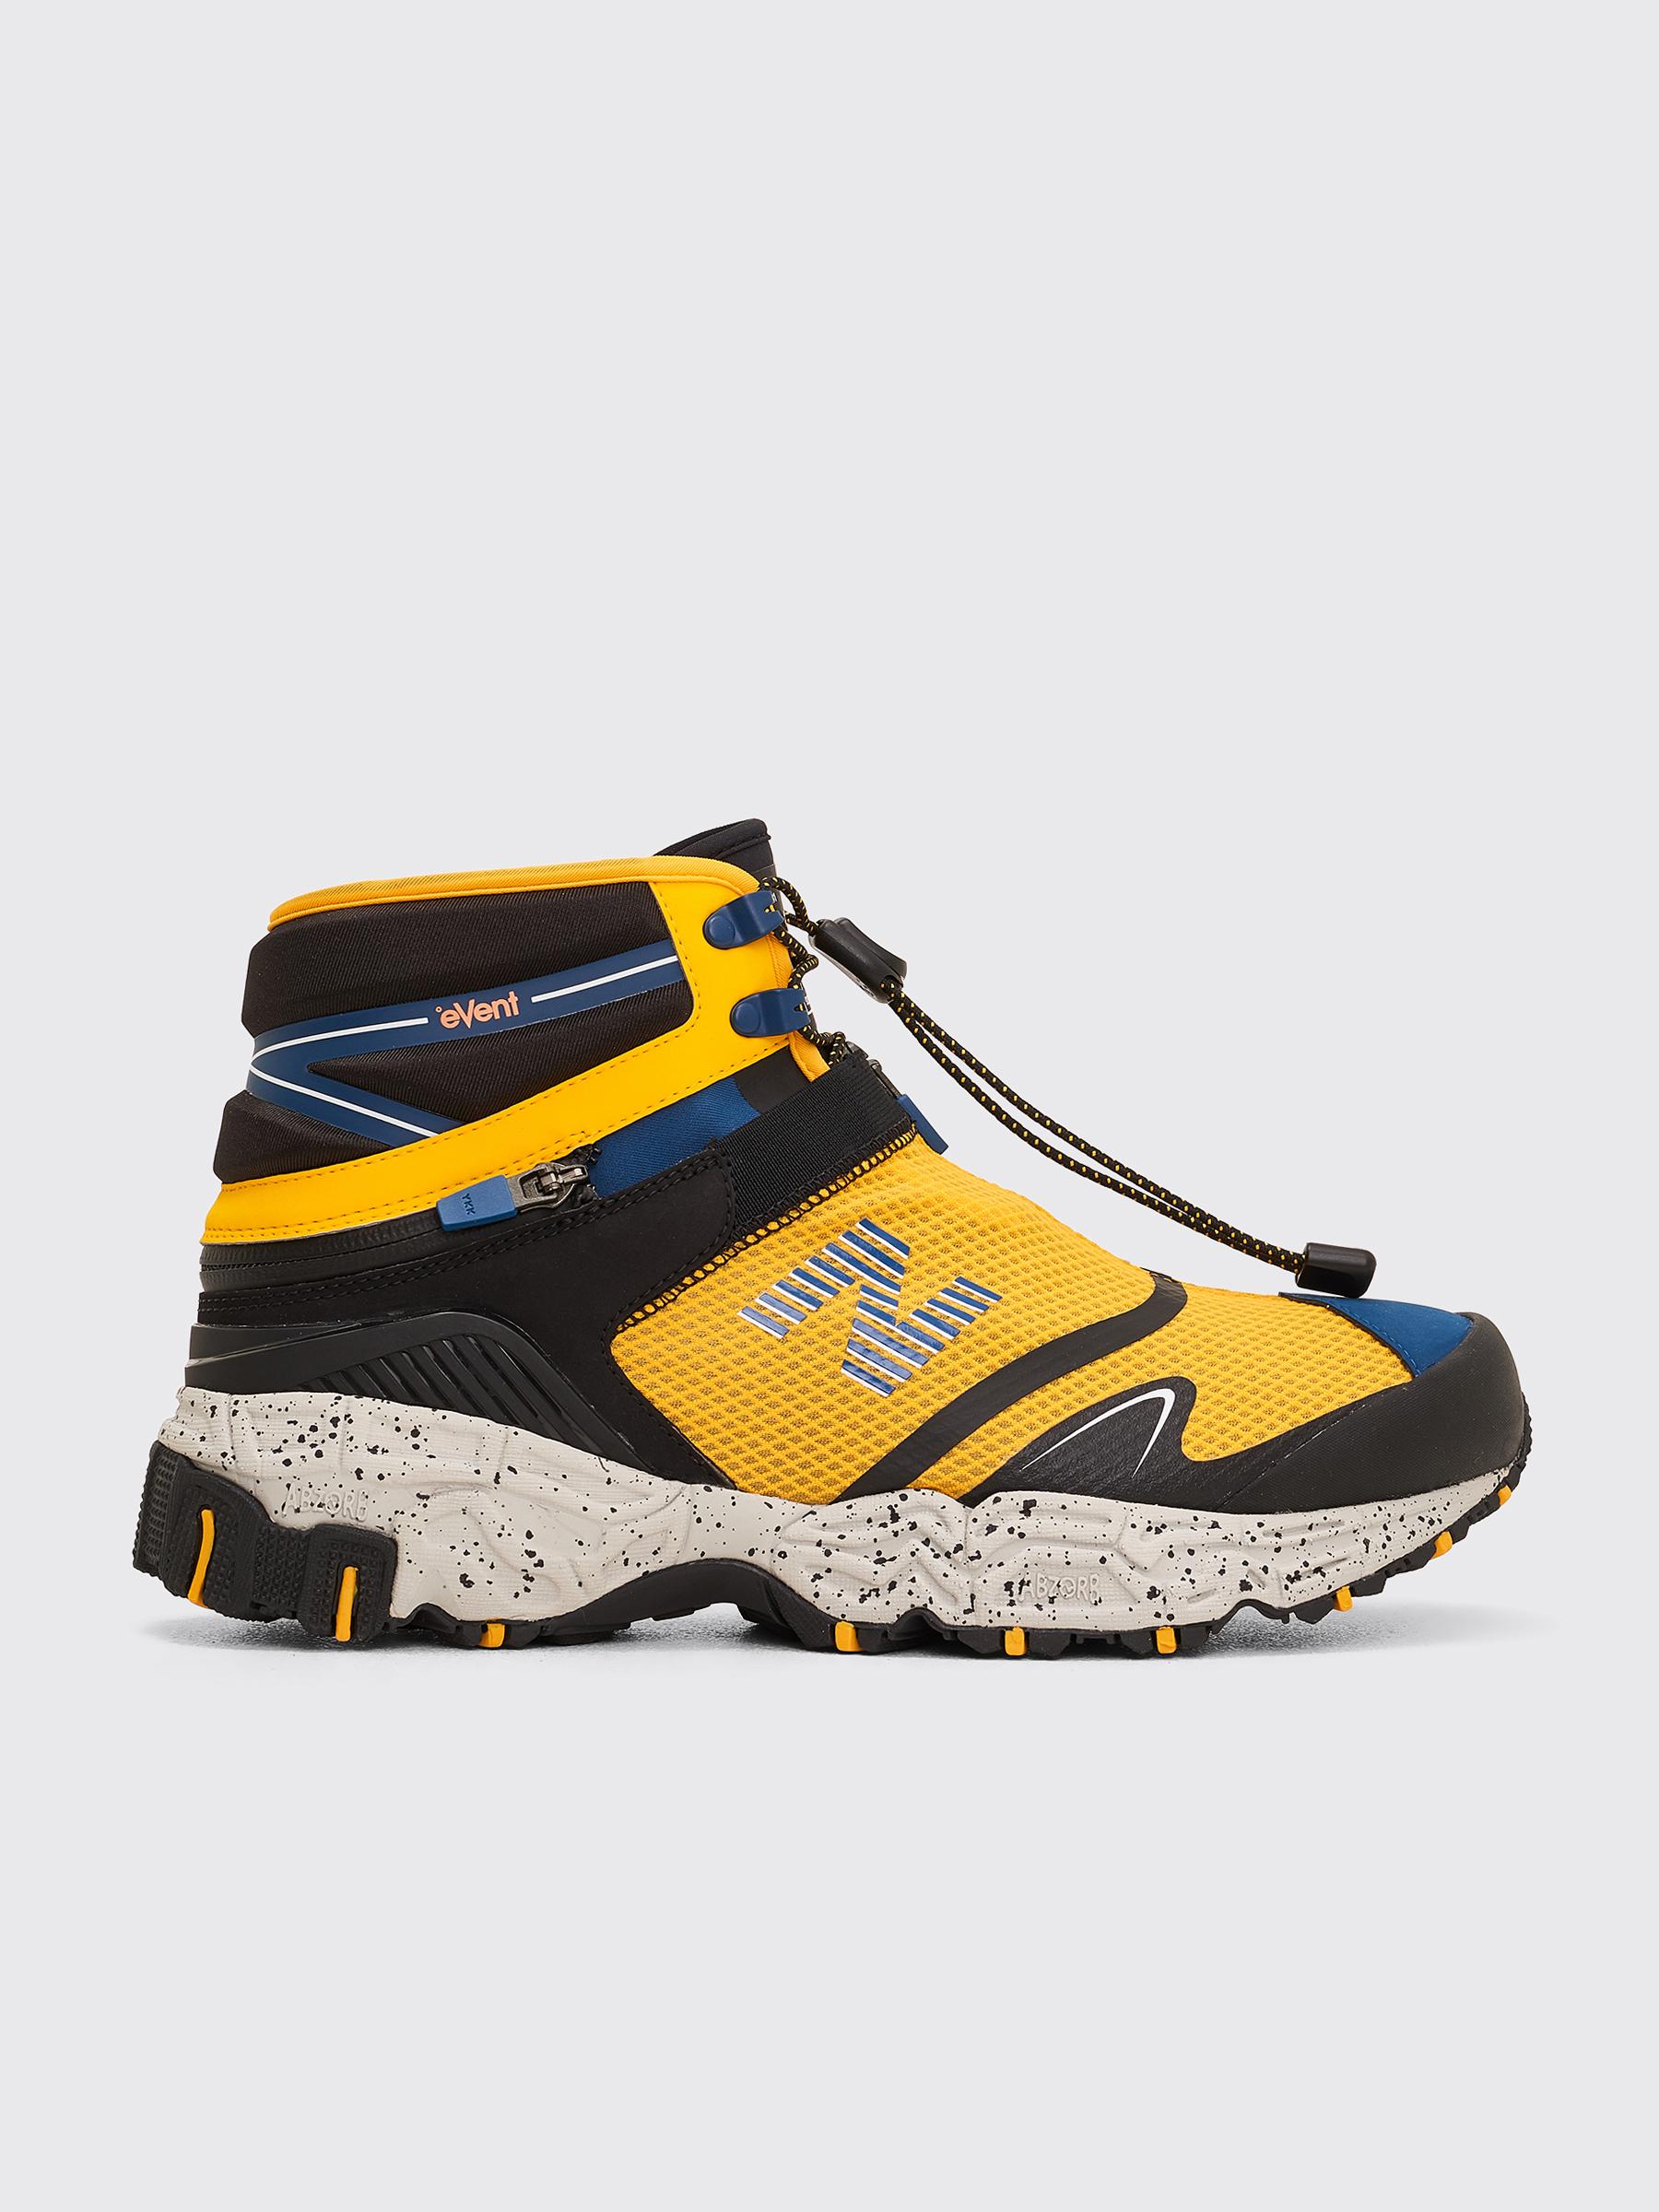 Très Bien - New Balance MSNB1 Yellow